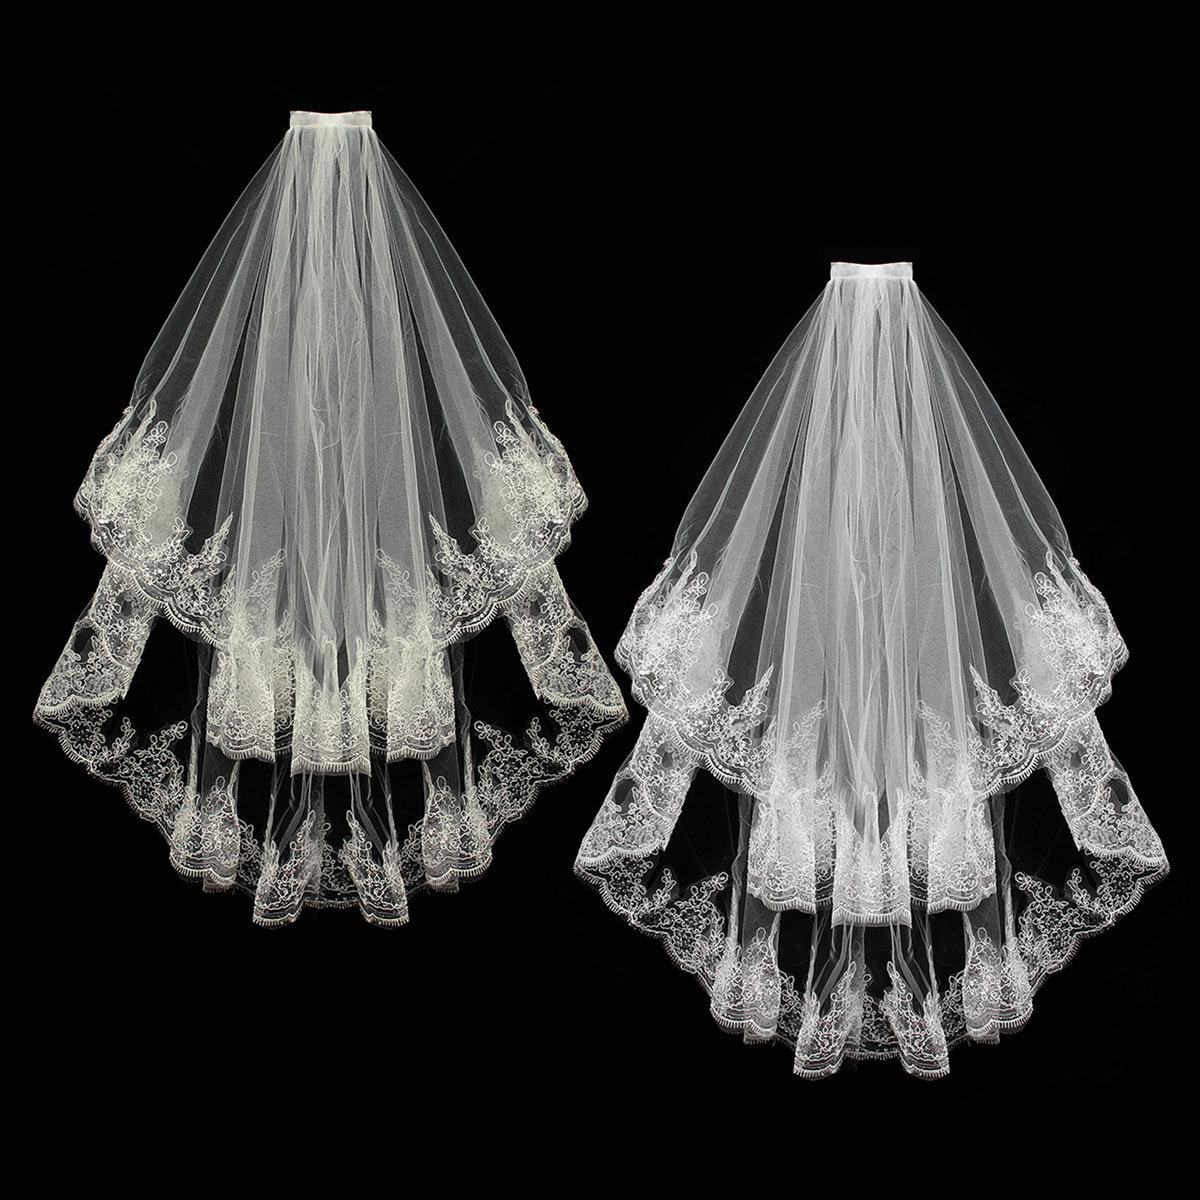 2 Layers Bride Lace Sequin Decorative Edge Bridal Wedding Elbow Veil With Comb